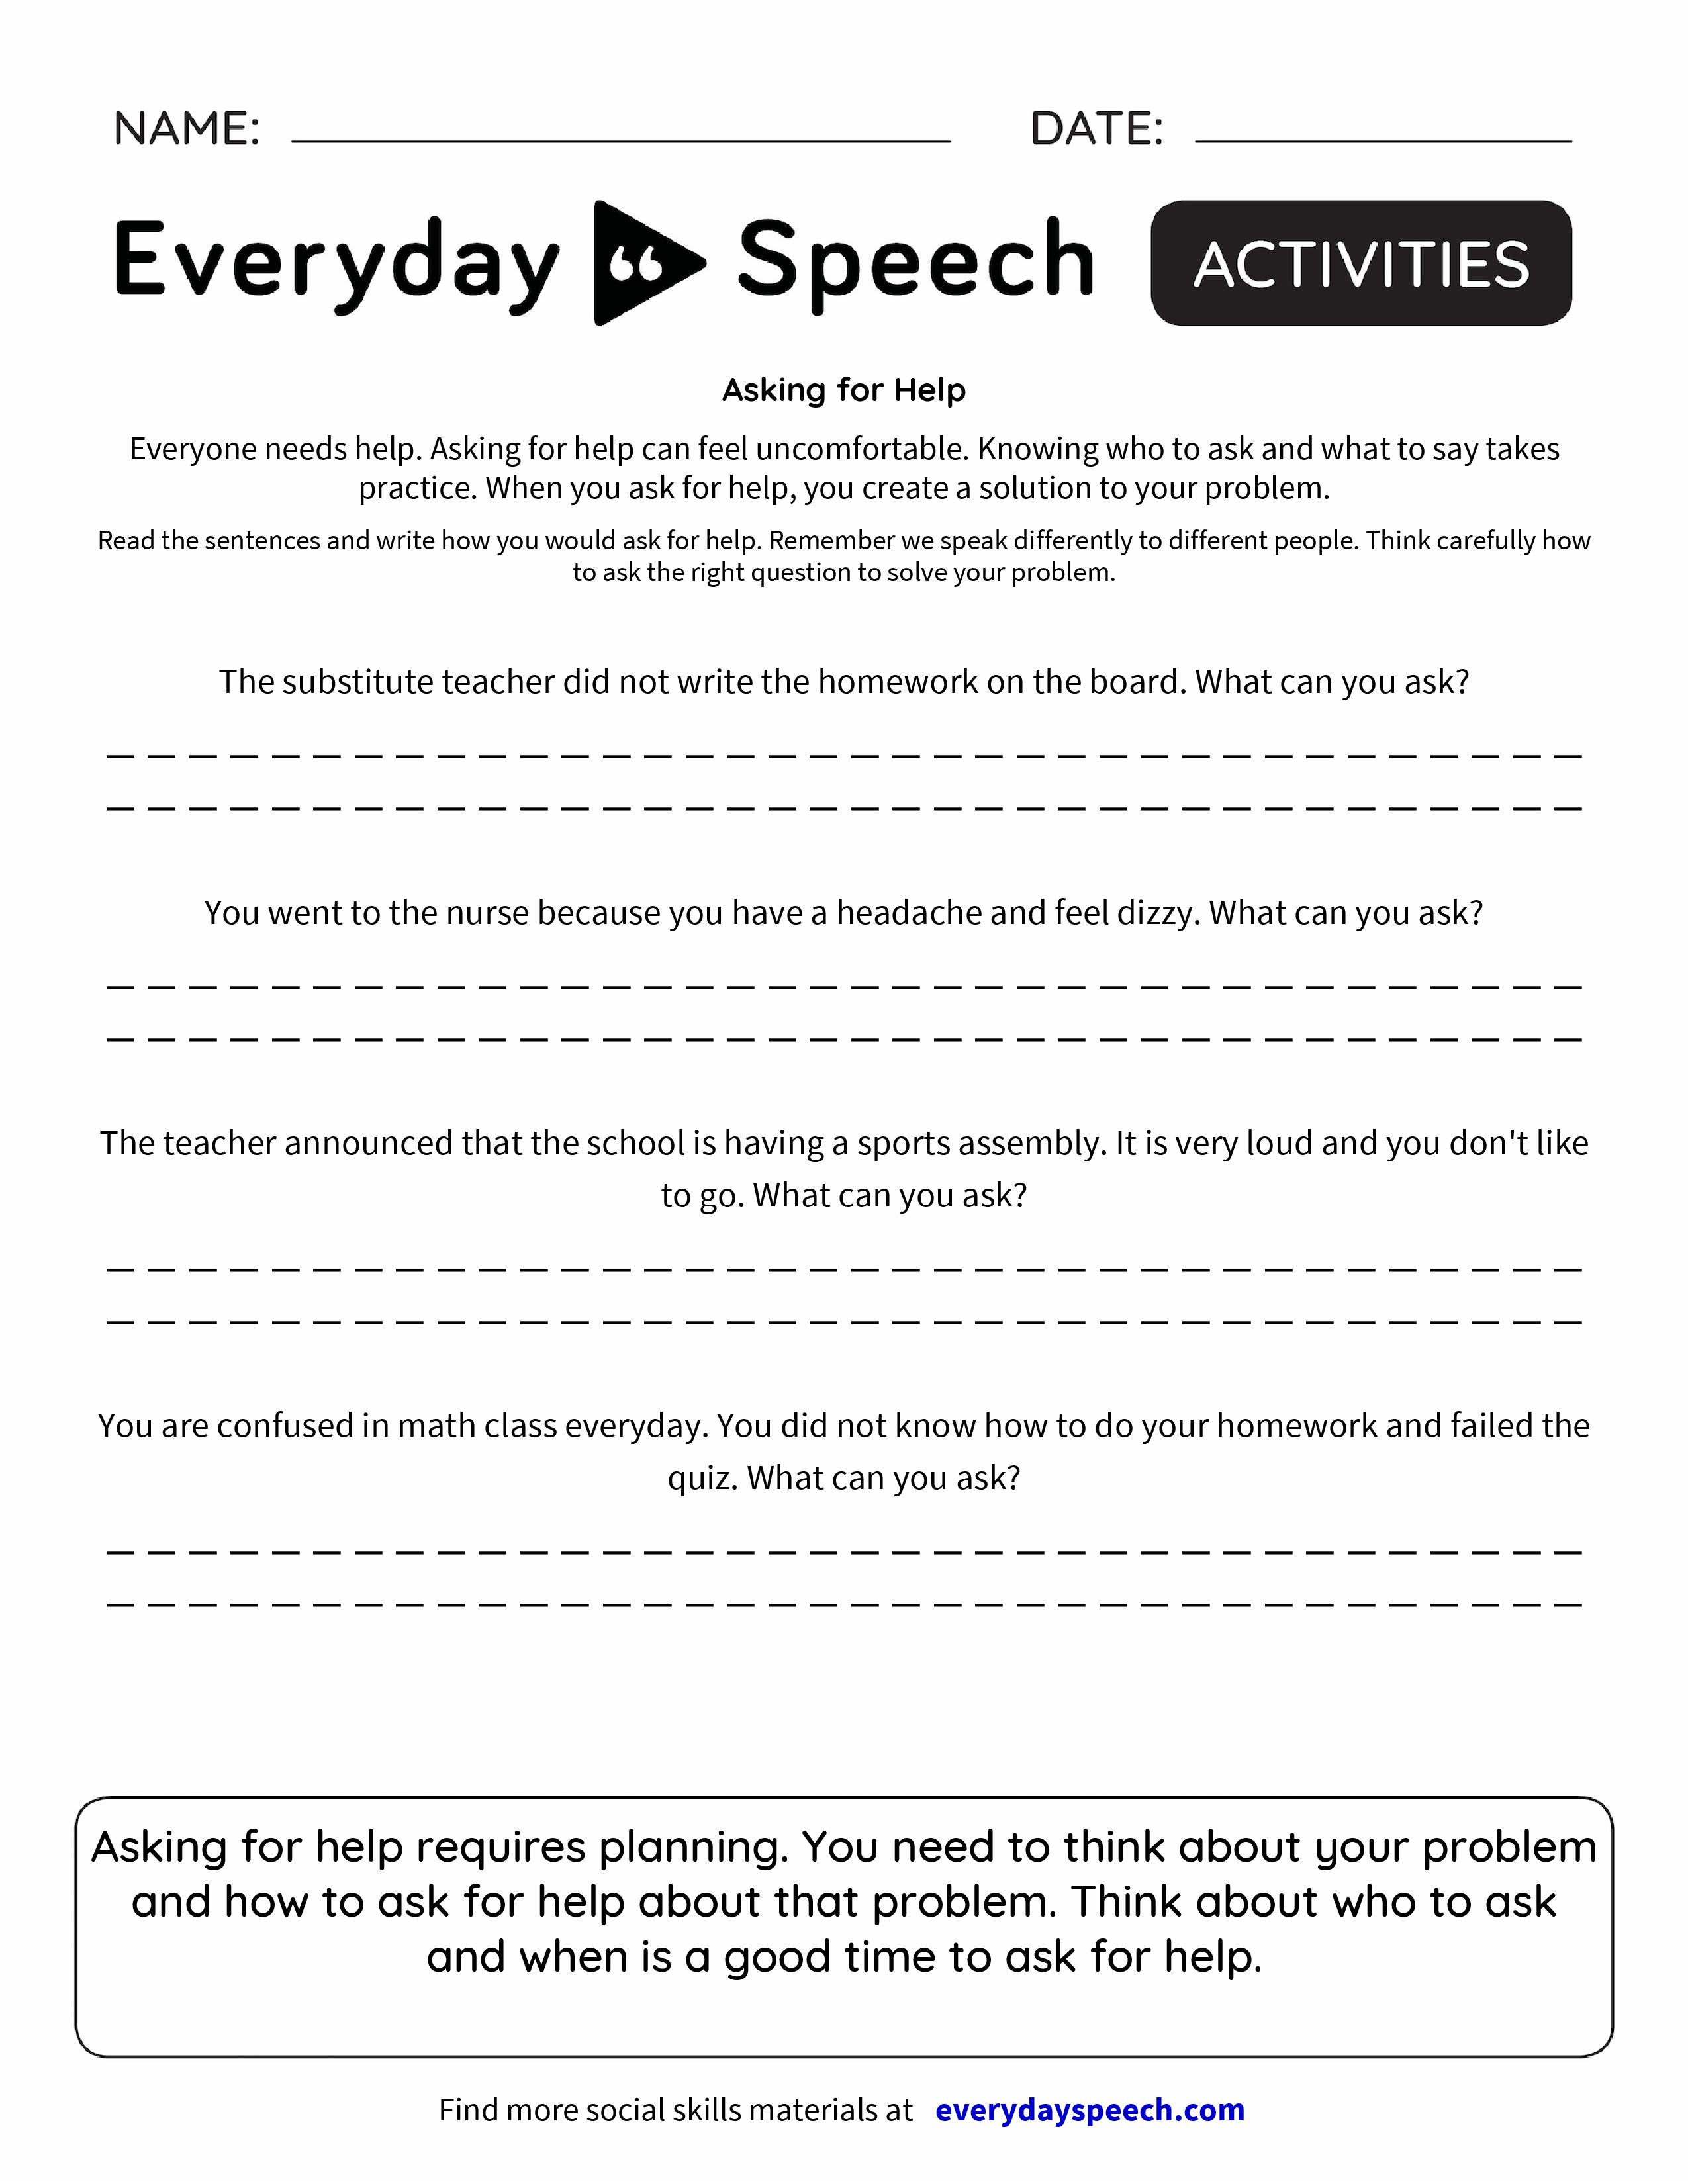 Asking for Help Everyday Speech Everyday Speech – Substitute Teacher Worksheets